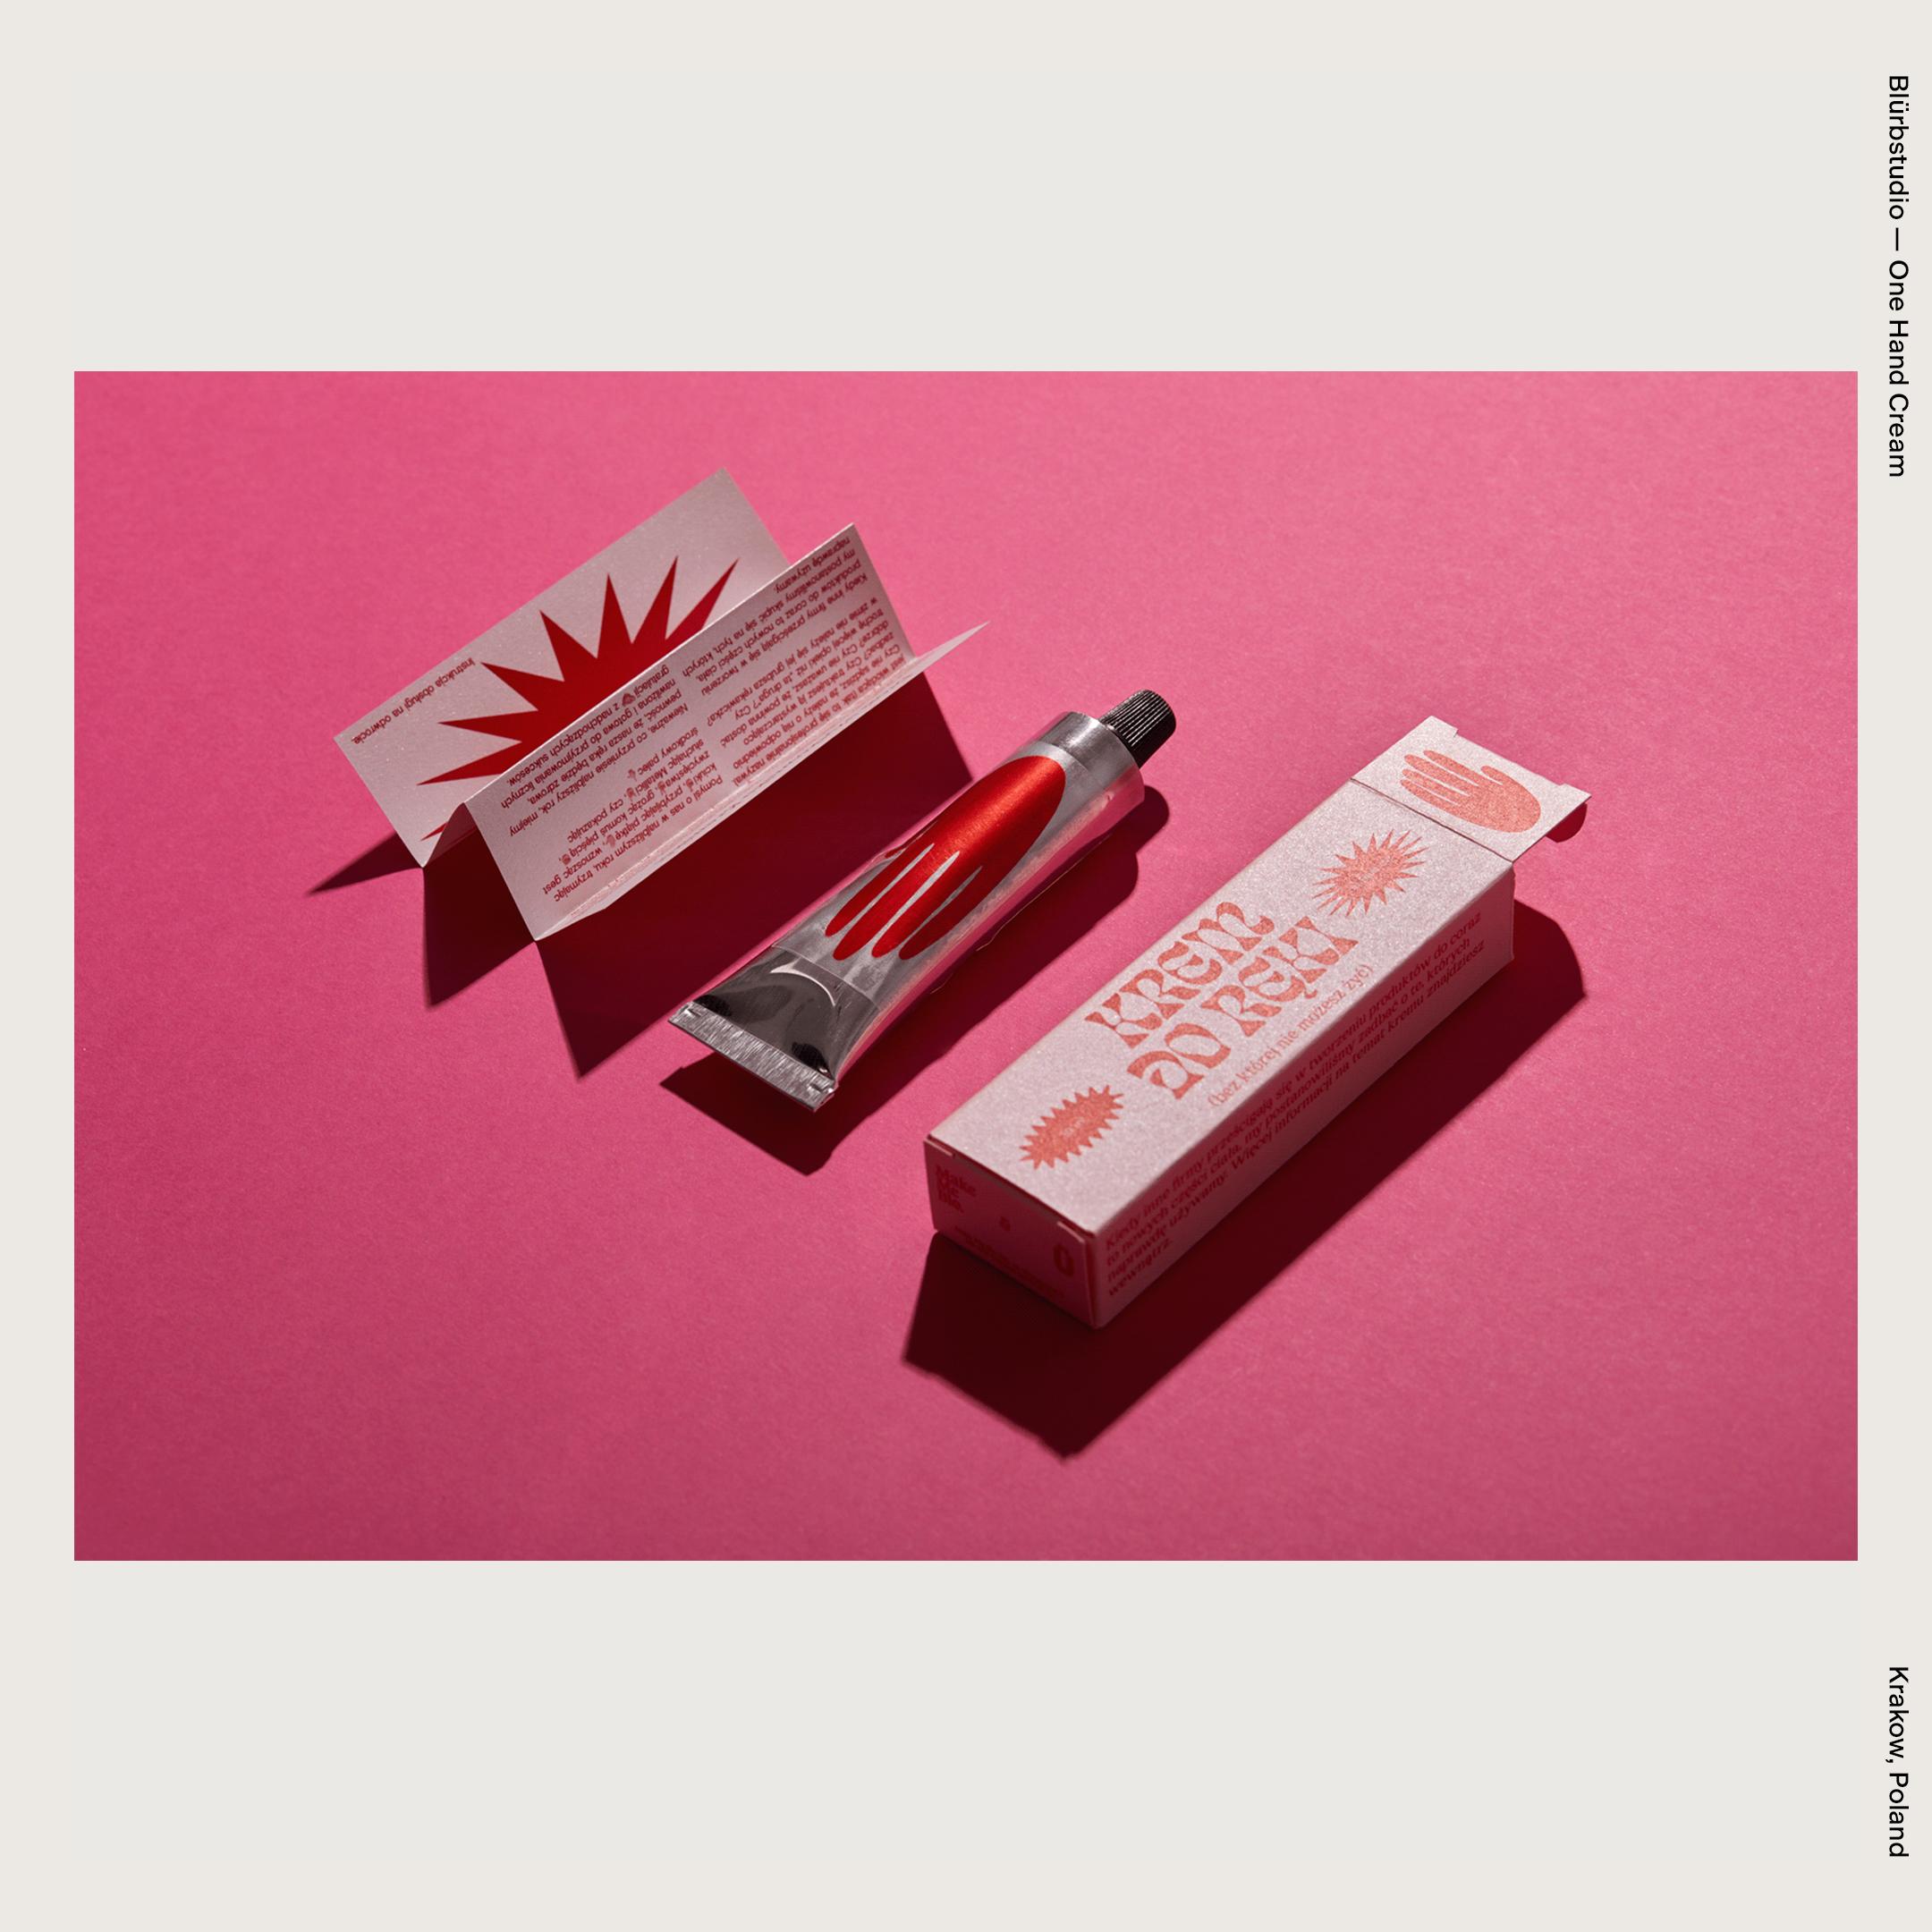 Blürbstudio — One Hand Cream